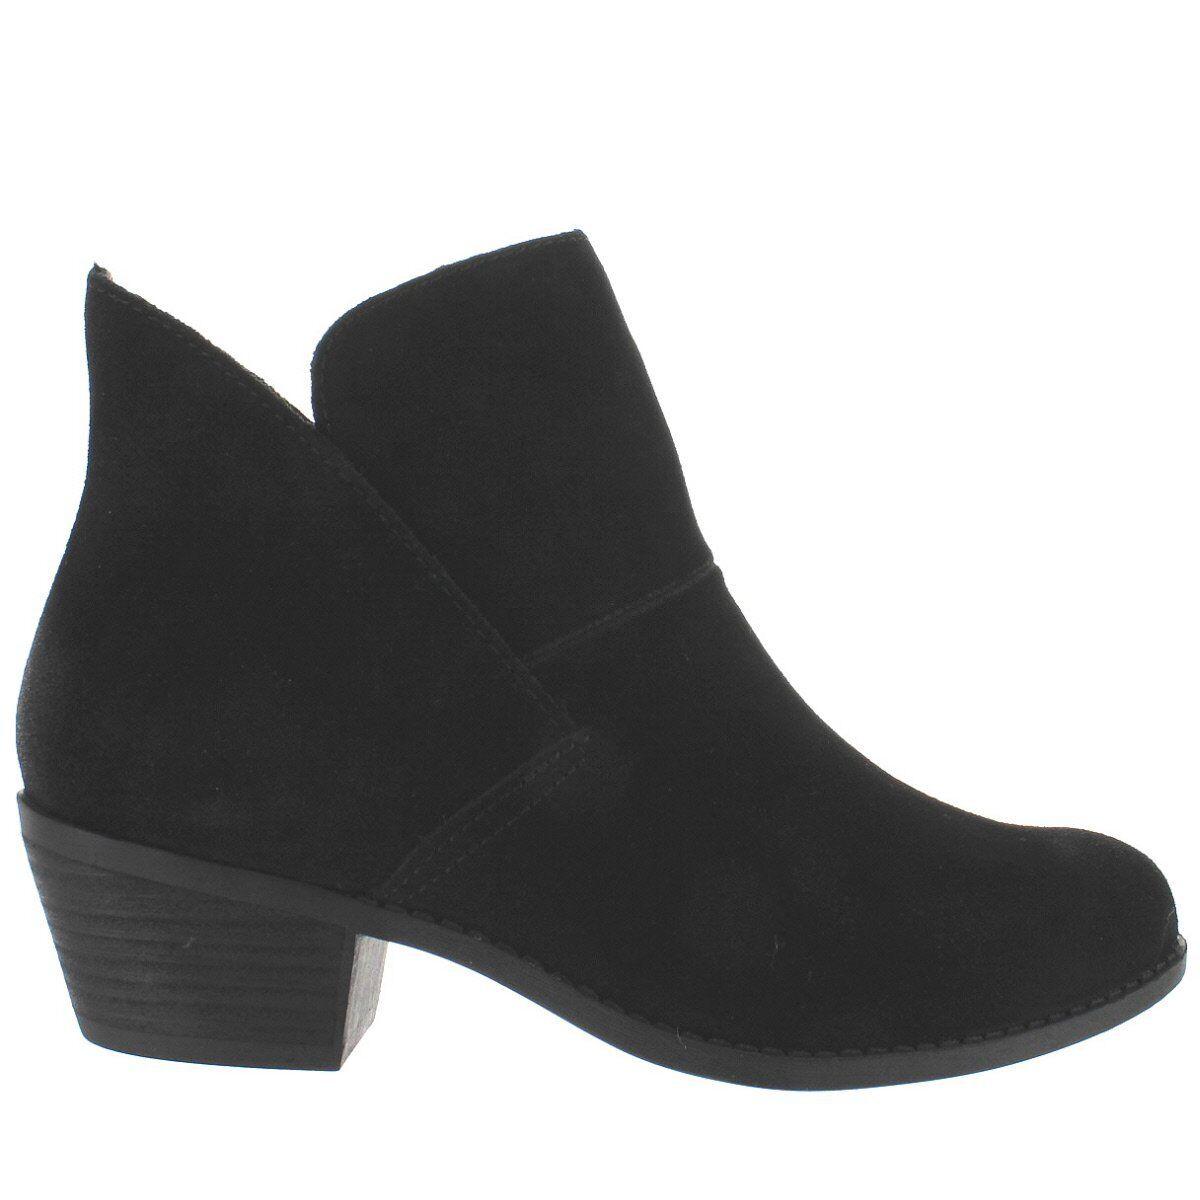 Me Too Zena - Black Suede Short Pull-On Western Bootie